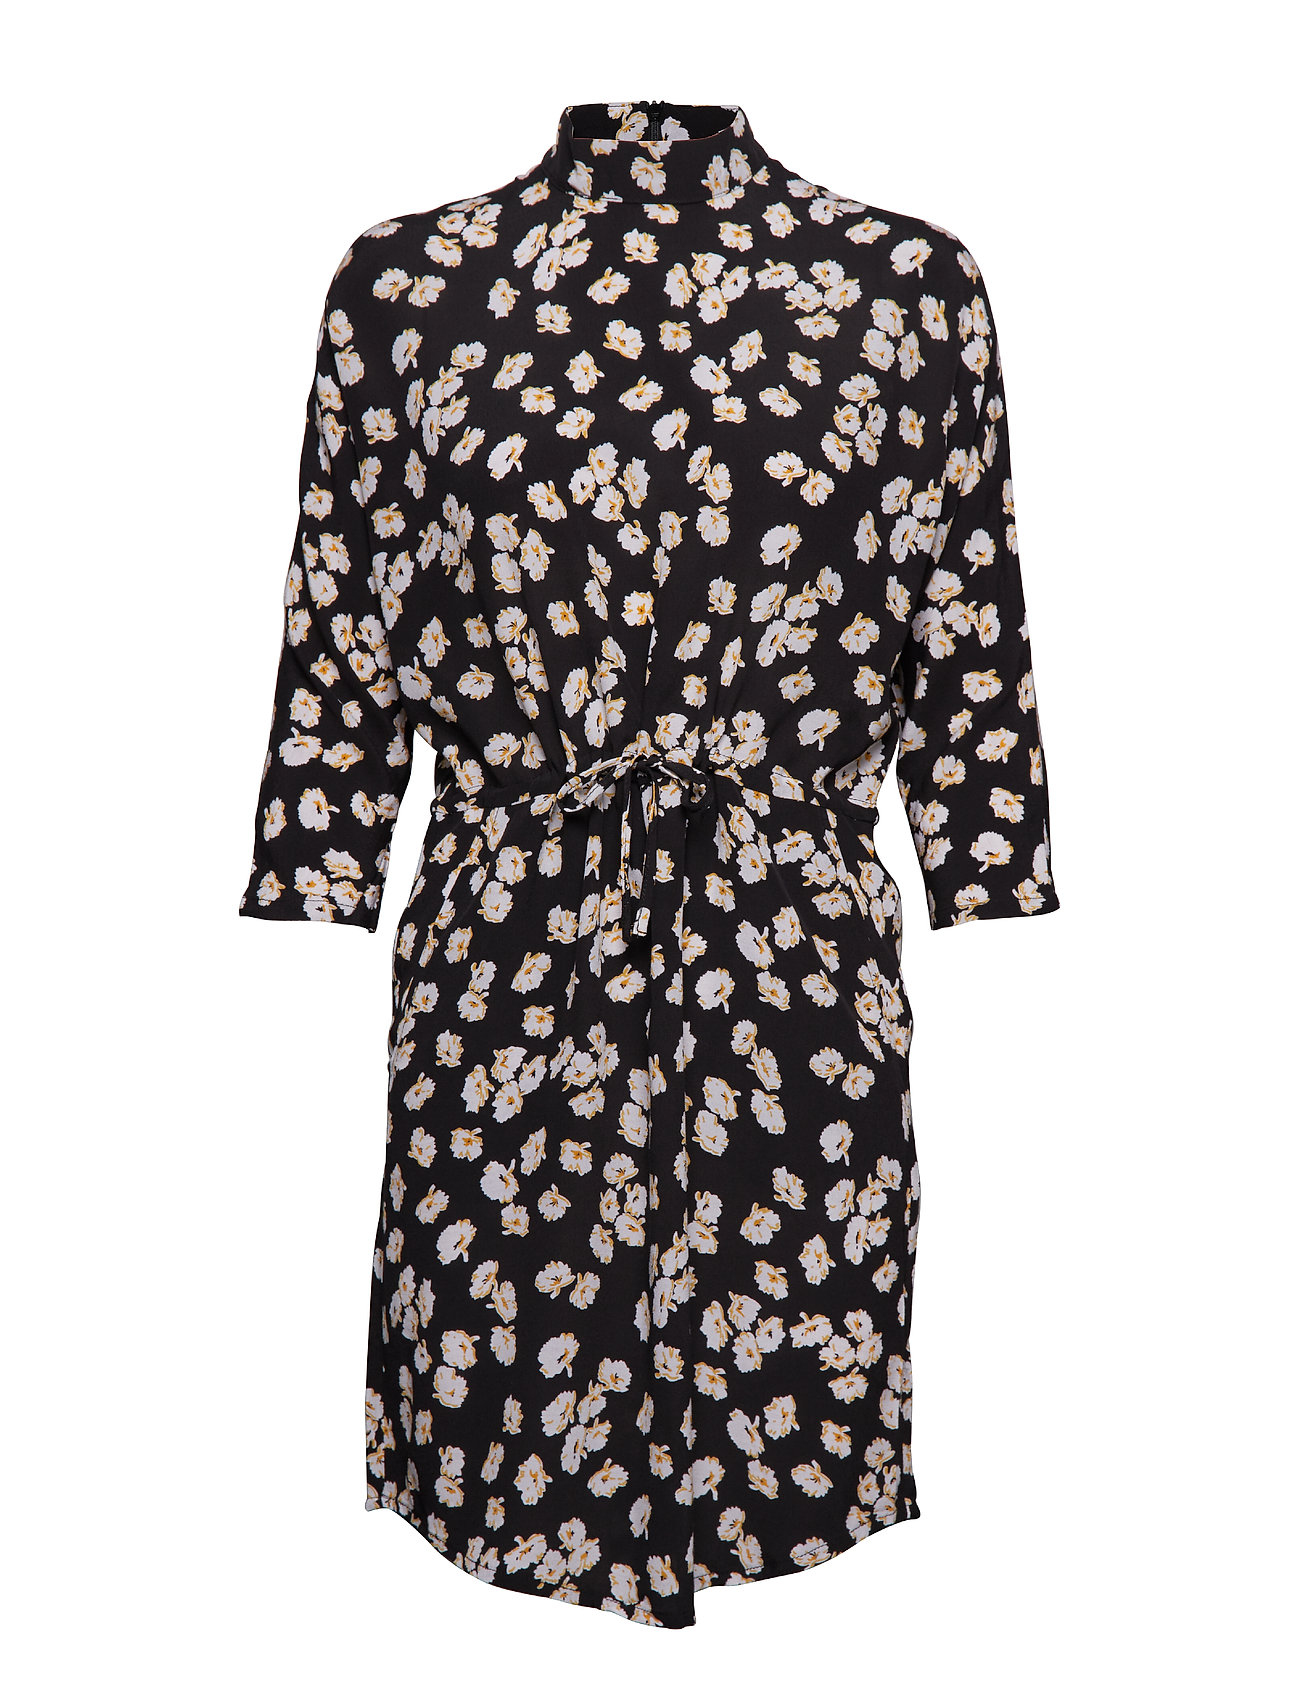 7412a87accdb Mash korte kjoler fra MbyM til dame i LORRIE PRINT - Pashion.dk